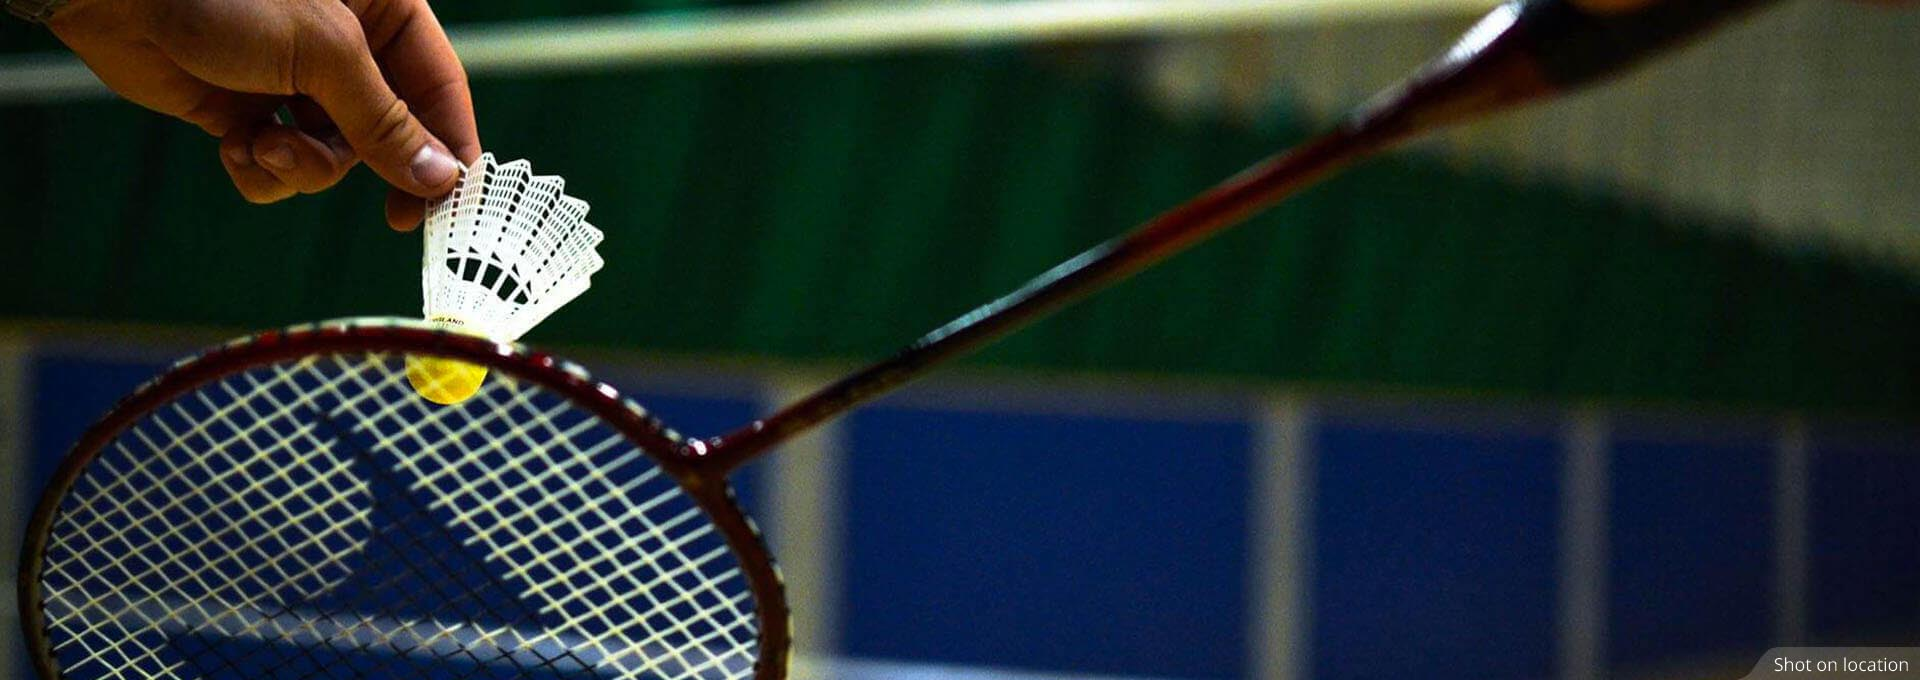 Badminton Court in Calgary by House of Hiranandani in Devanahalli, Bengaluru